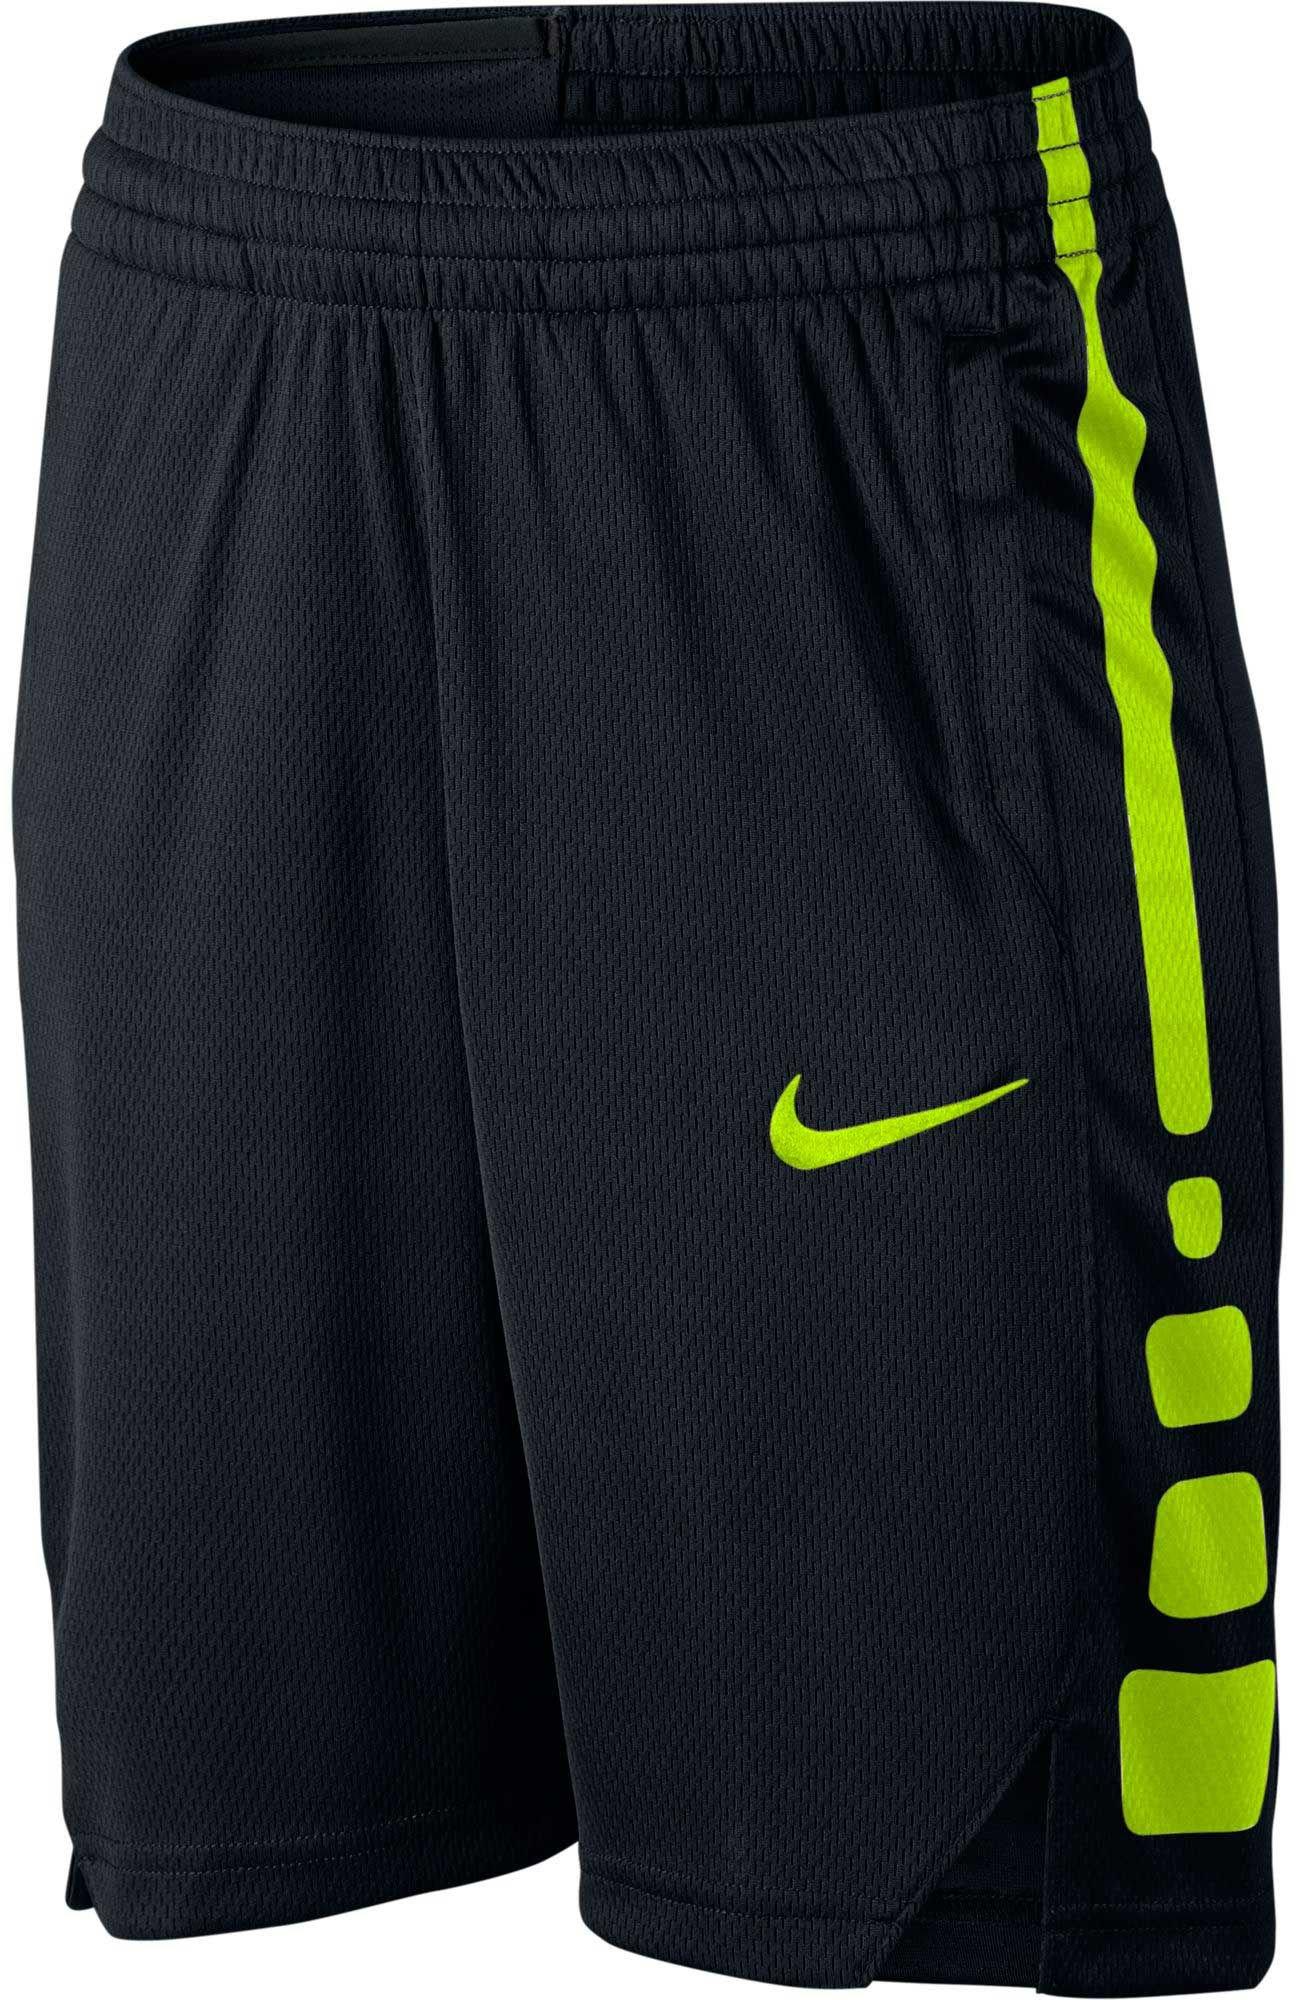 NIKE Boy's Dry Basketball Short (Black/Volt, Small)